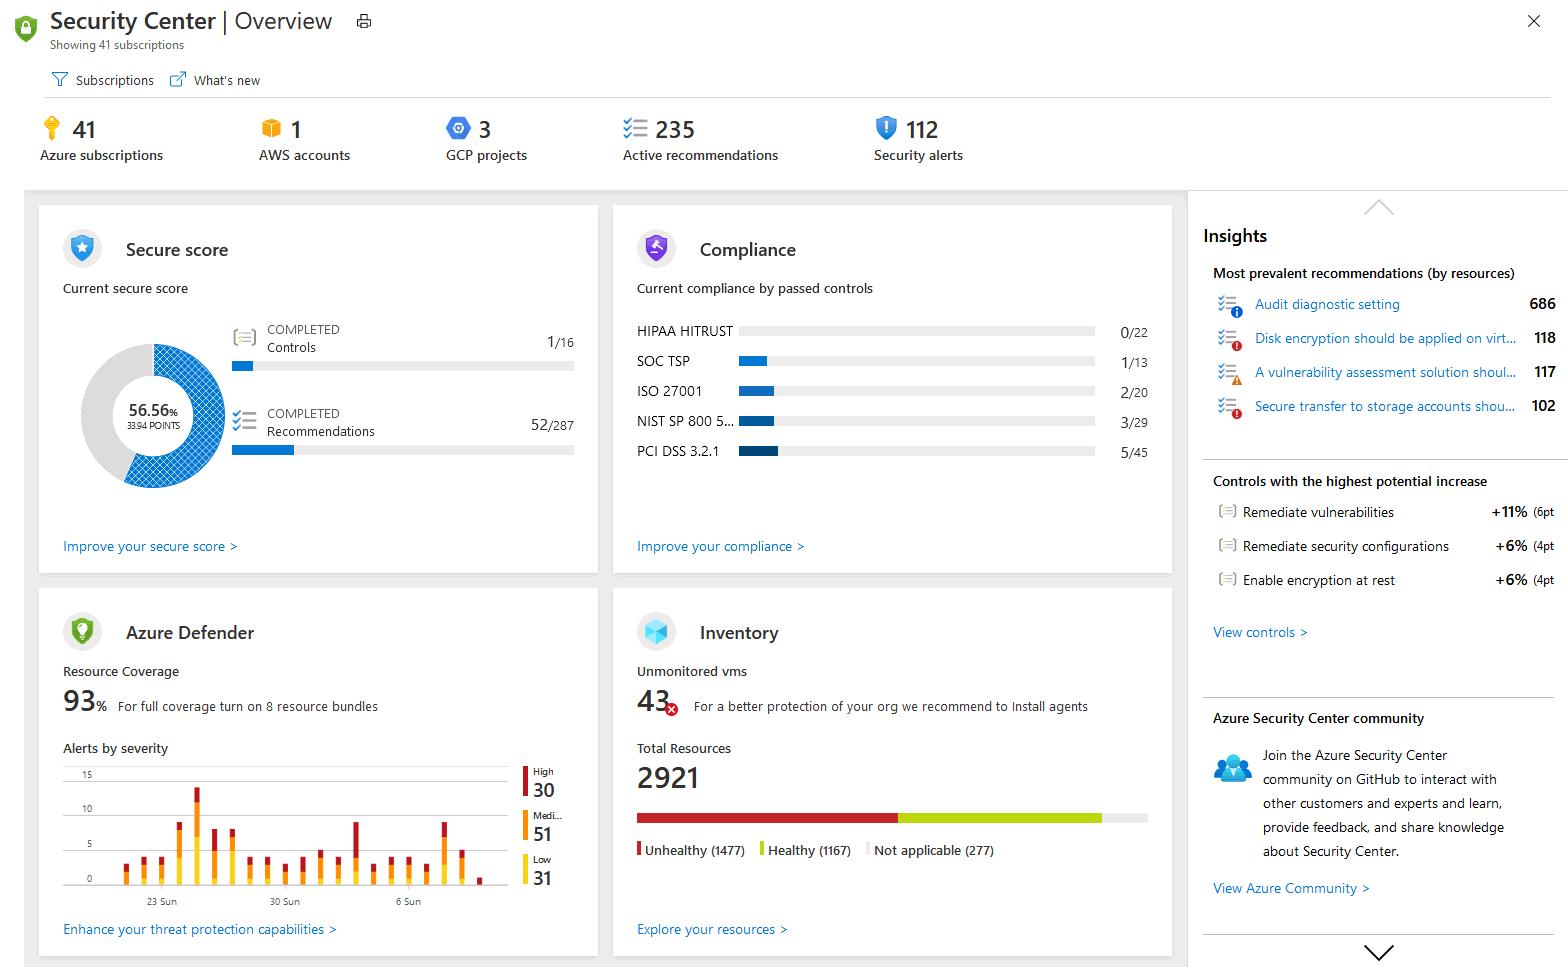 Azure Security Center Dashboard